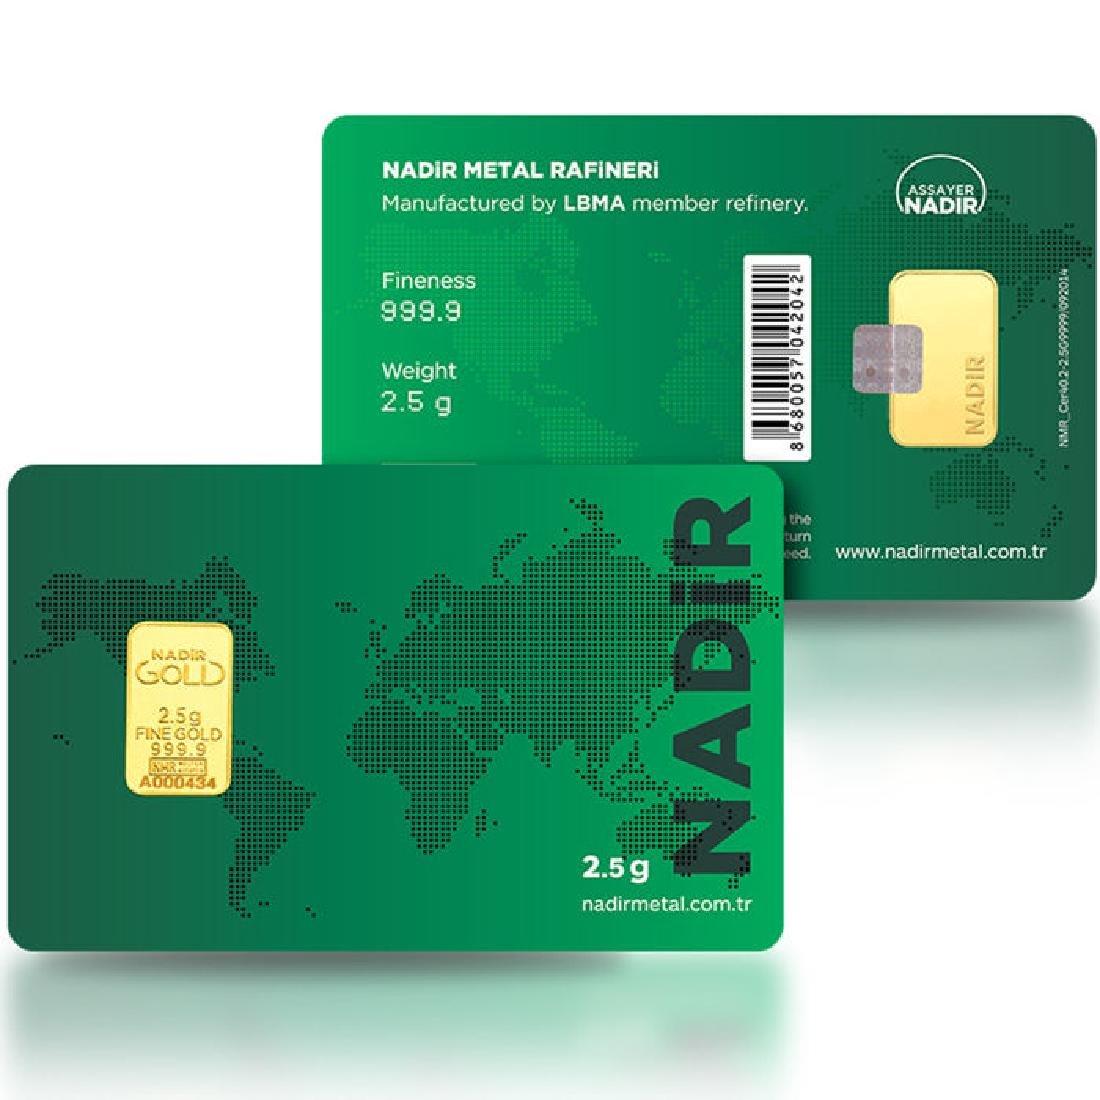 2.5g - 999.9/1000 - Minted/ Sealed Gold Bar - 3